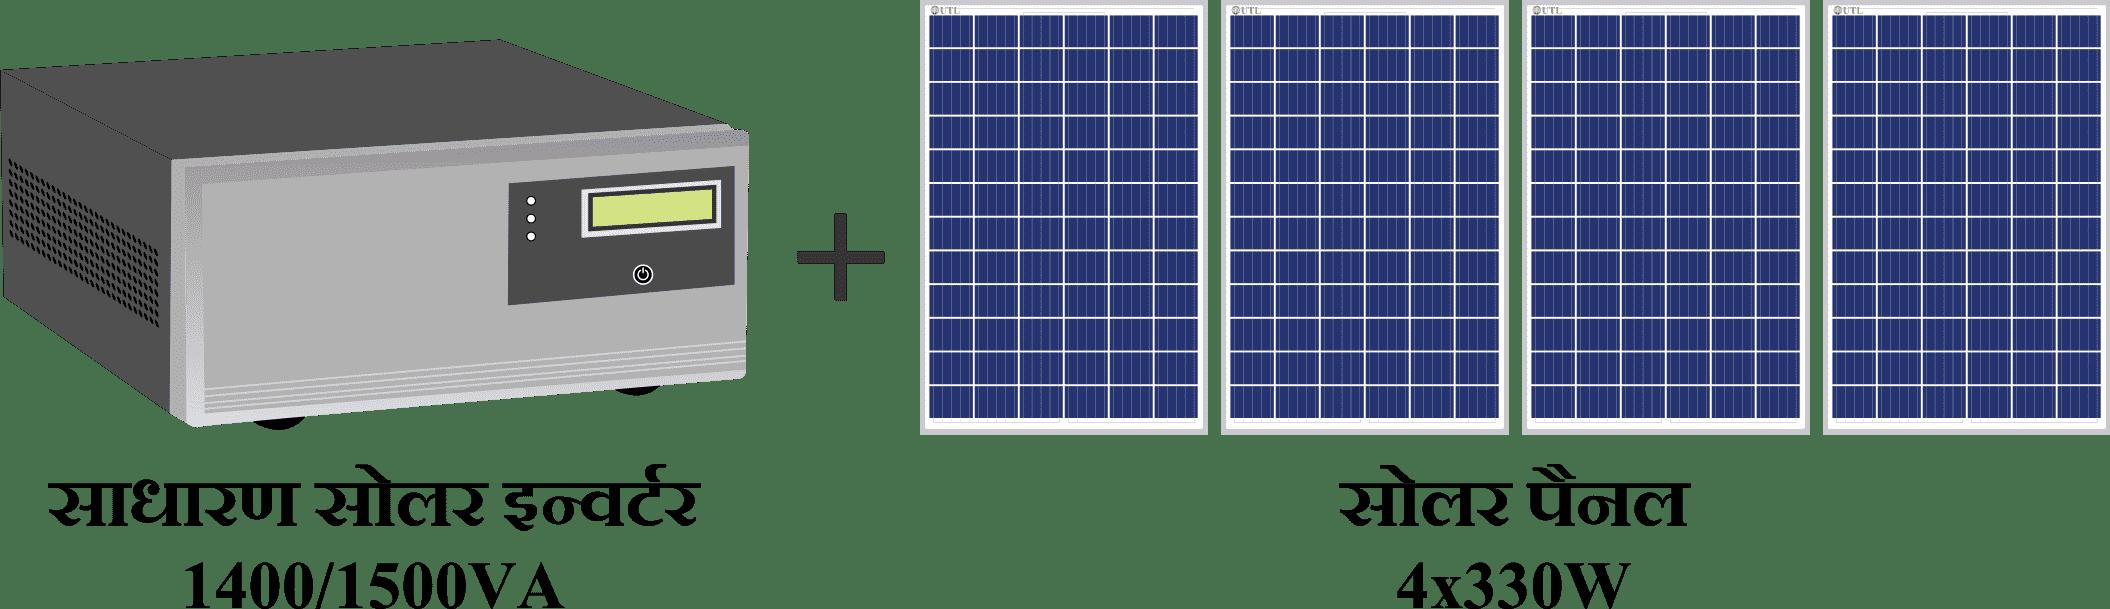 Comparison of Normal Inverter with Gamma Solar Inverter